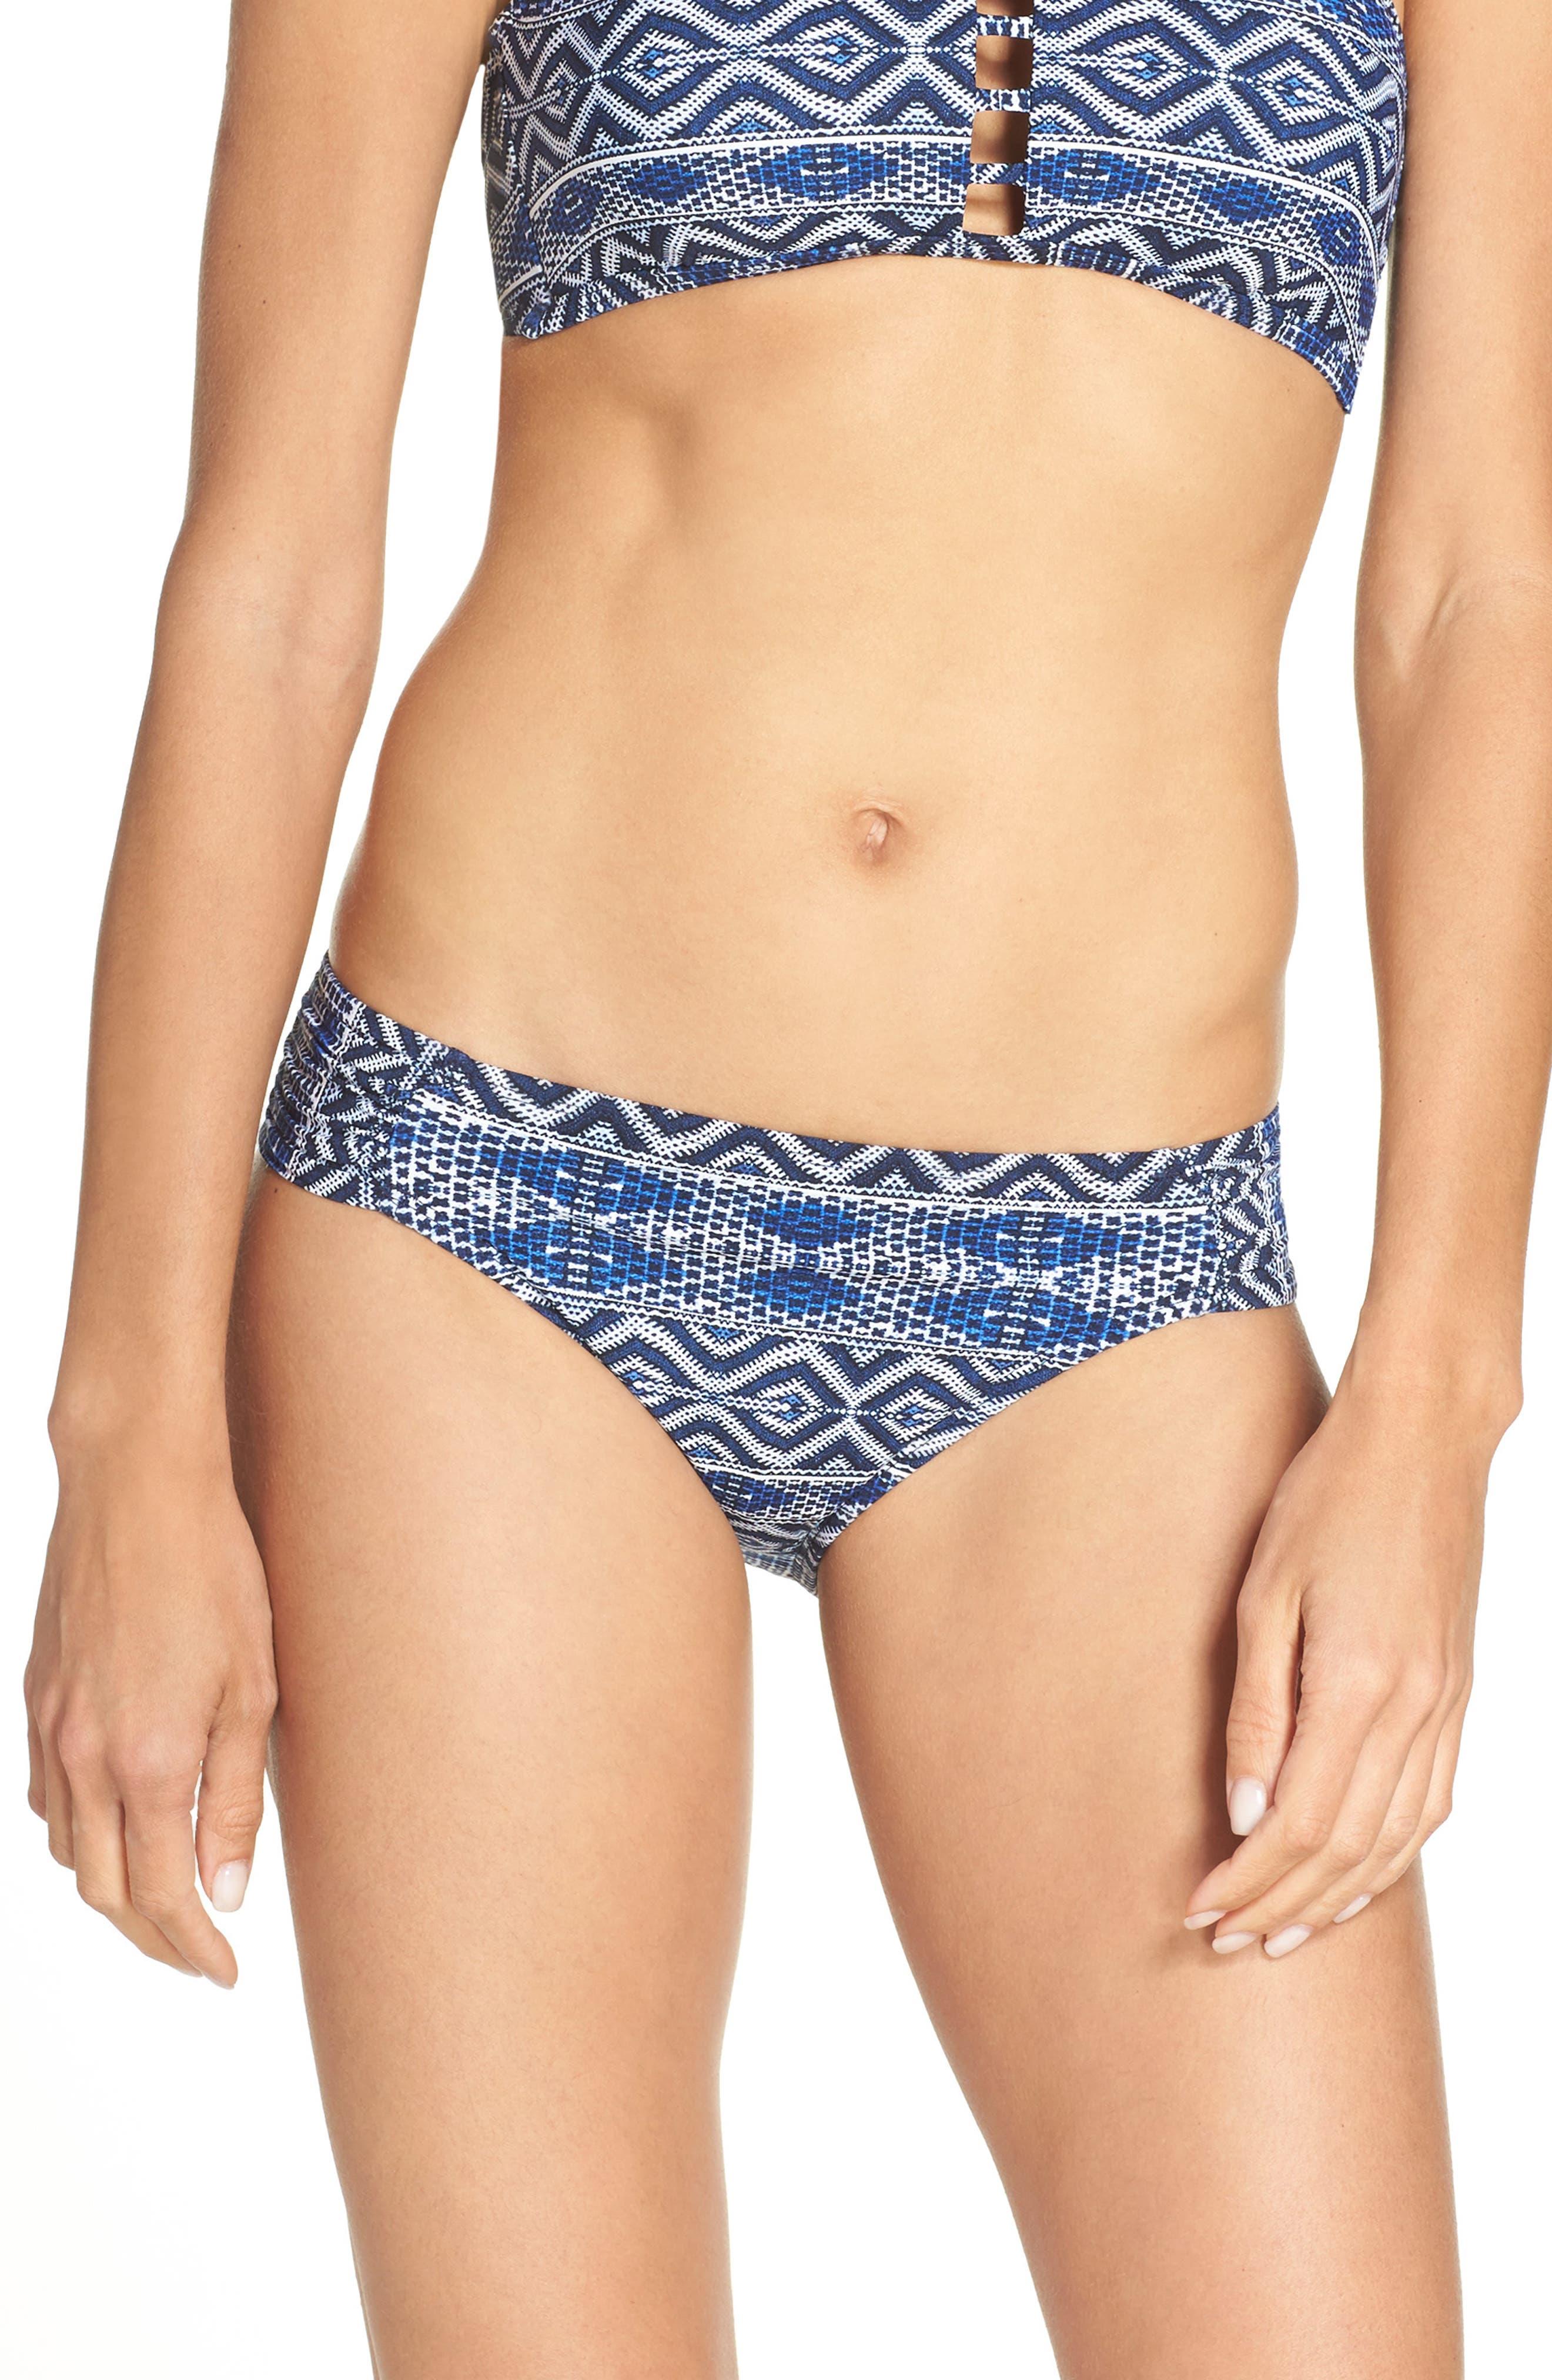 Alternate Image 1 Selected - La Blanca Designer Jeans Hipster Bikini Bottoms